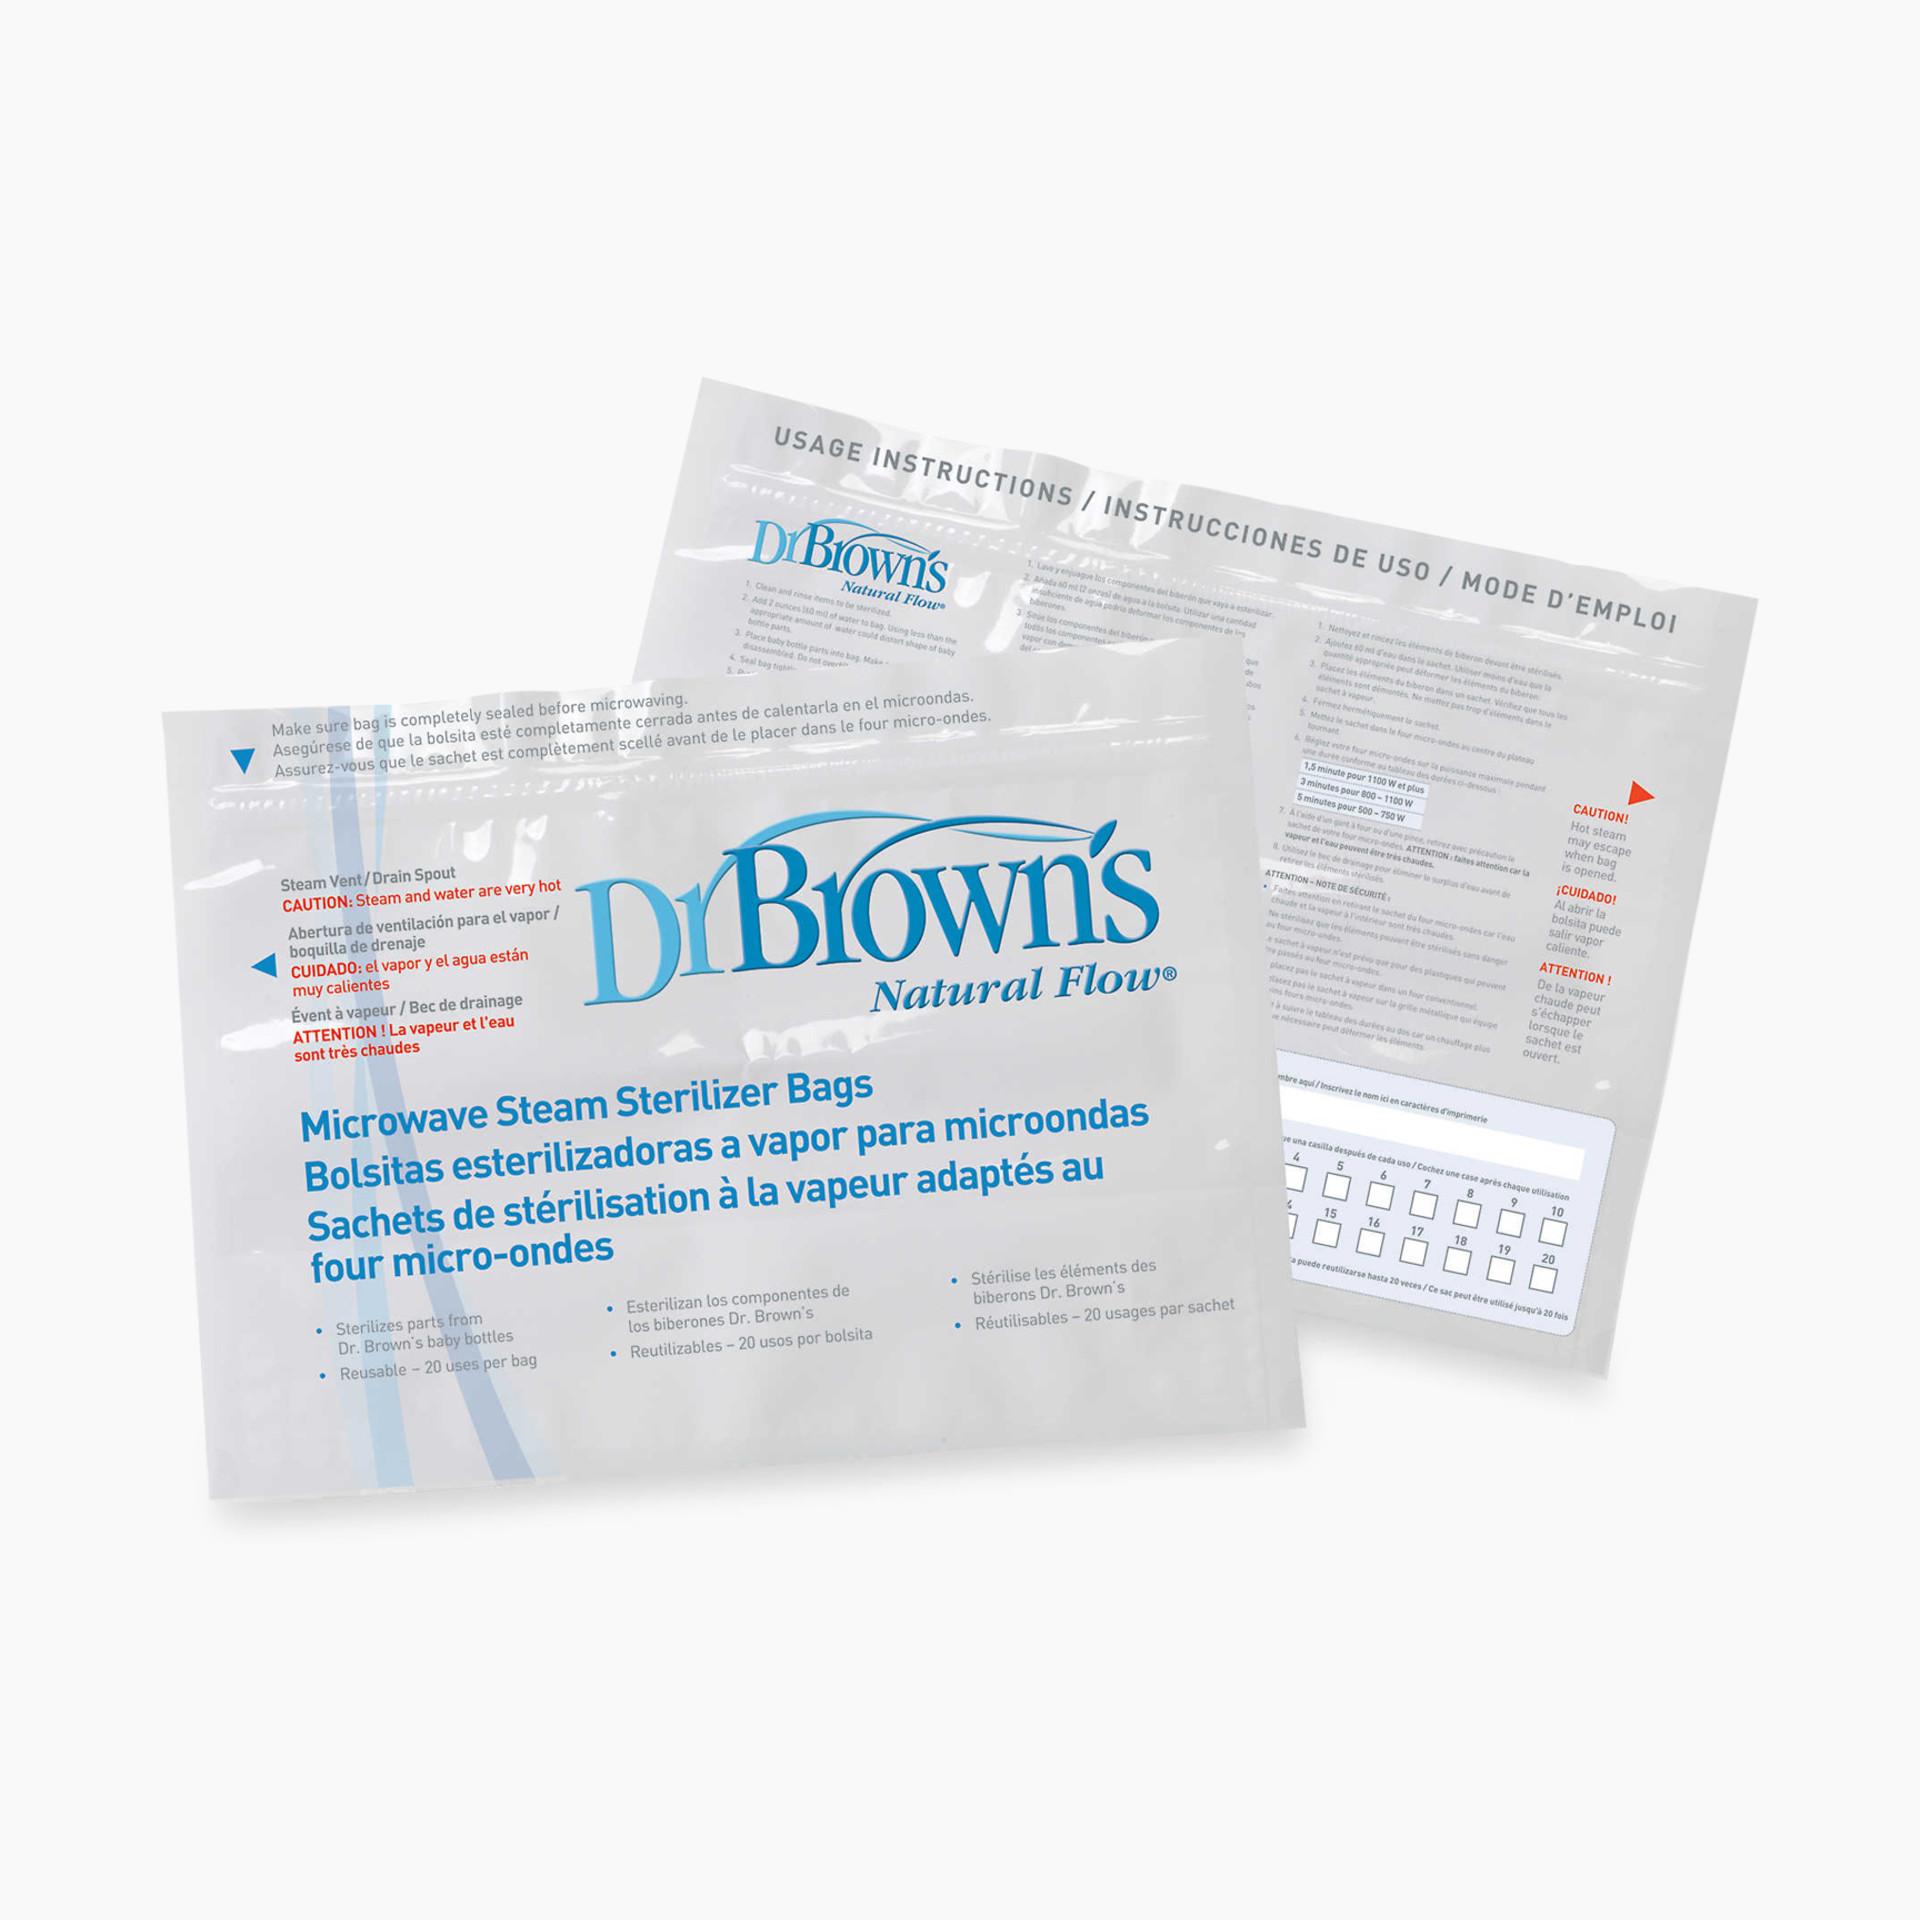 Dr Brown Smicrowave Steam Sterilizer Bags